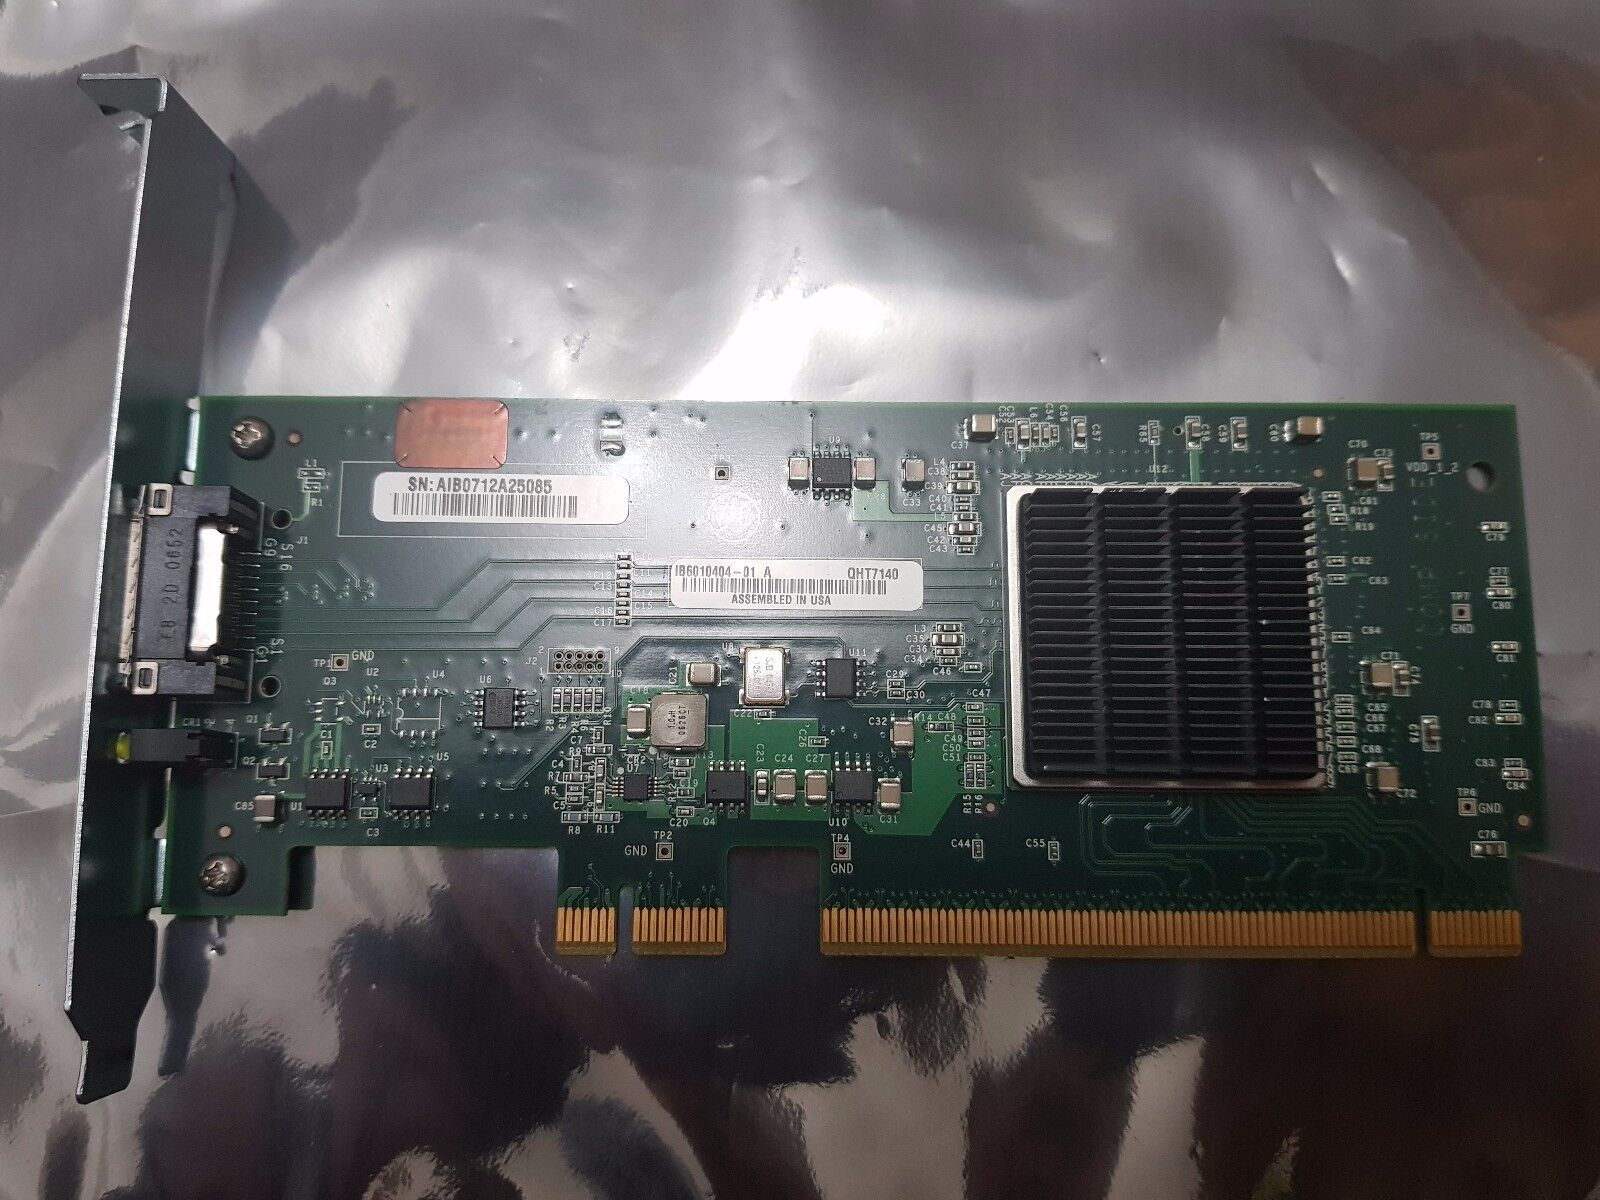 QLogic InfiniPath QHT7140 IB6010404 InfiniBand SDR 4x 10Gb HTX